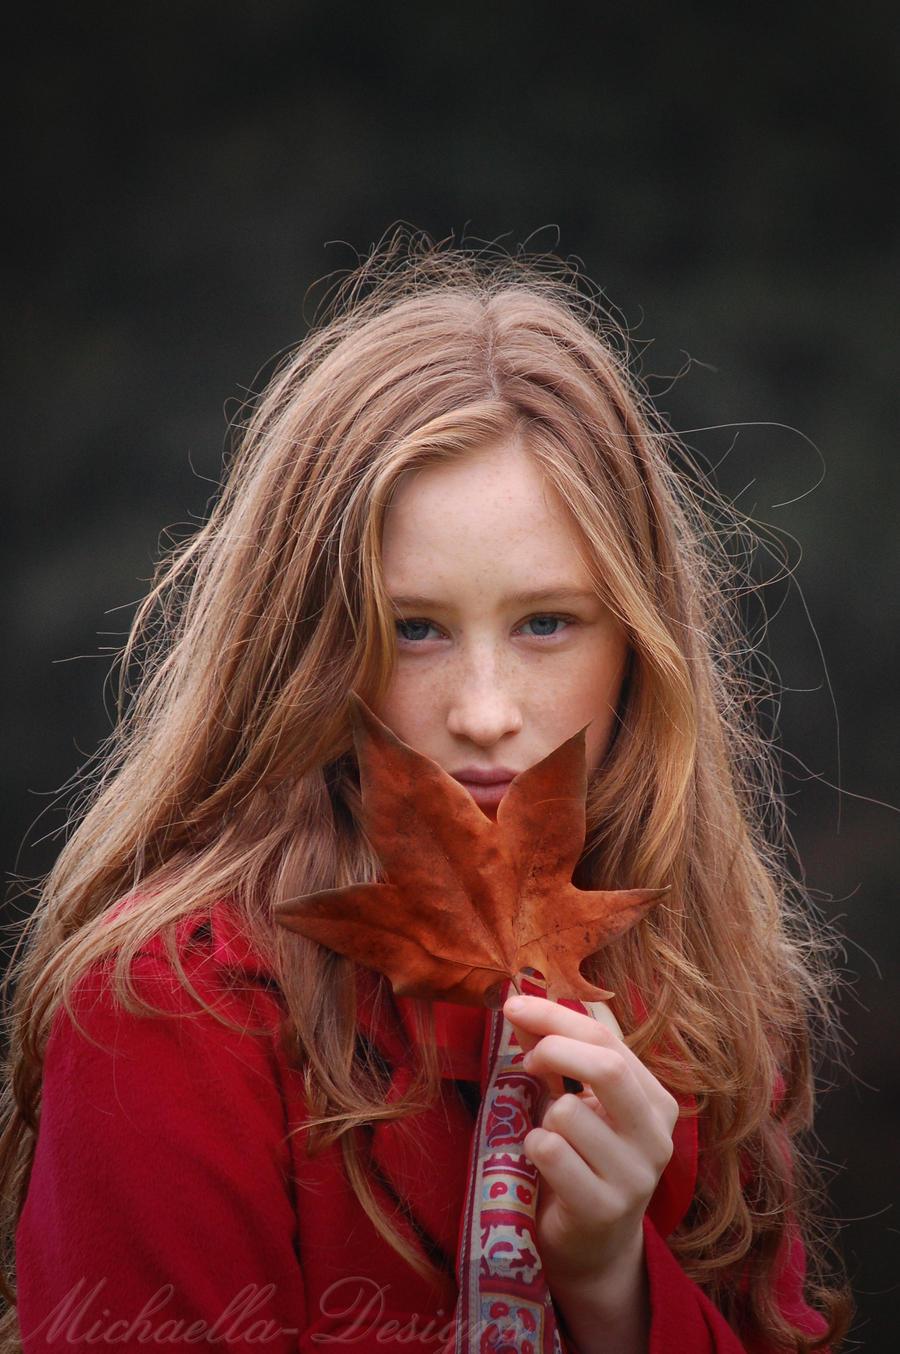 Autumn Child by Michaella-Designs